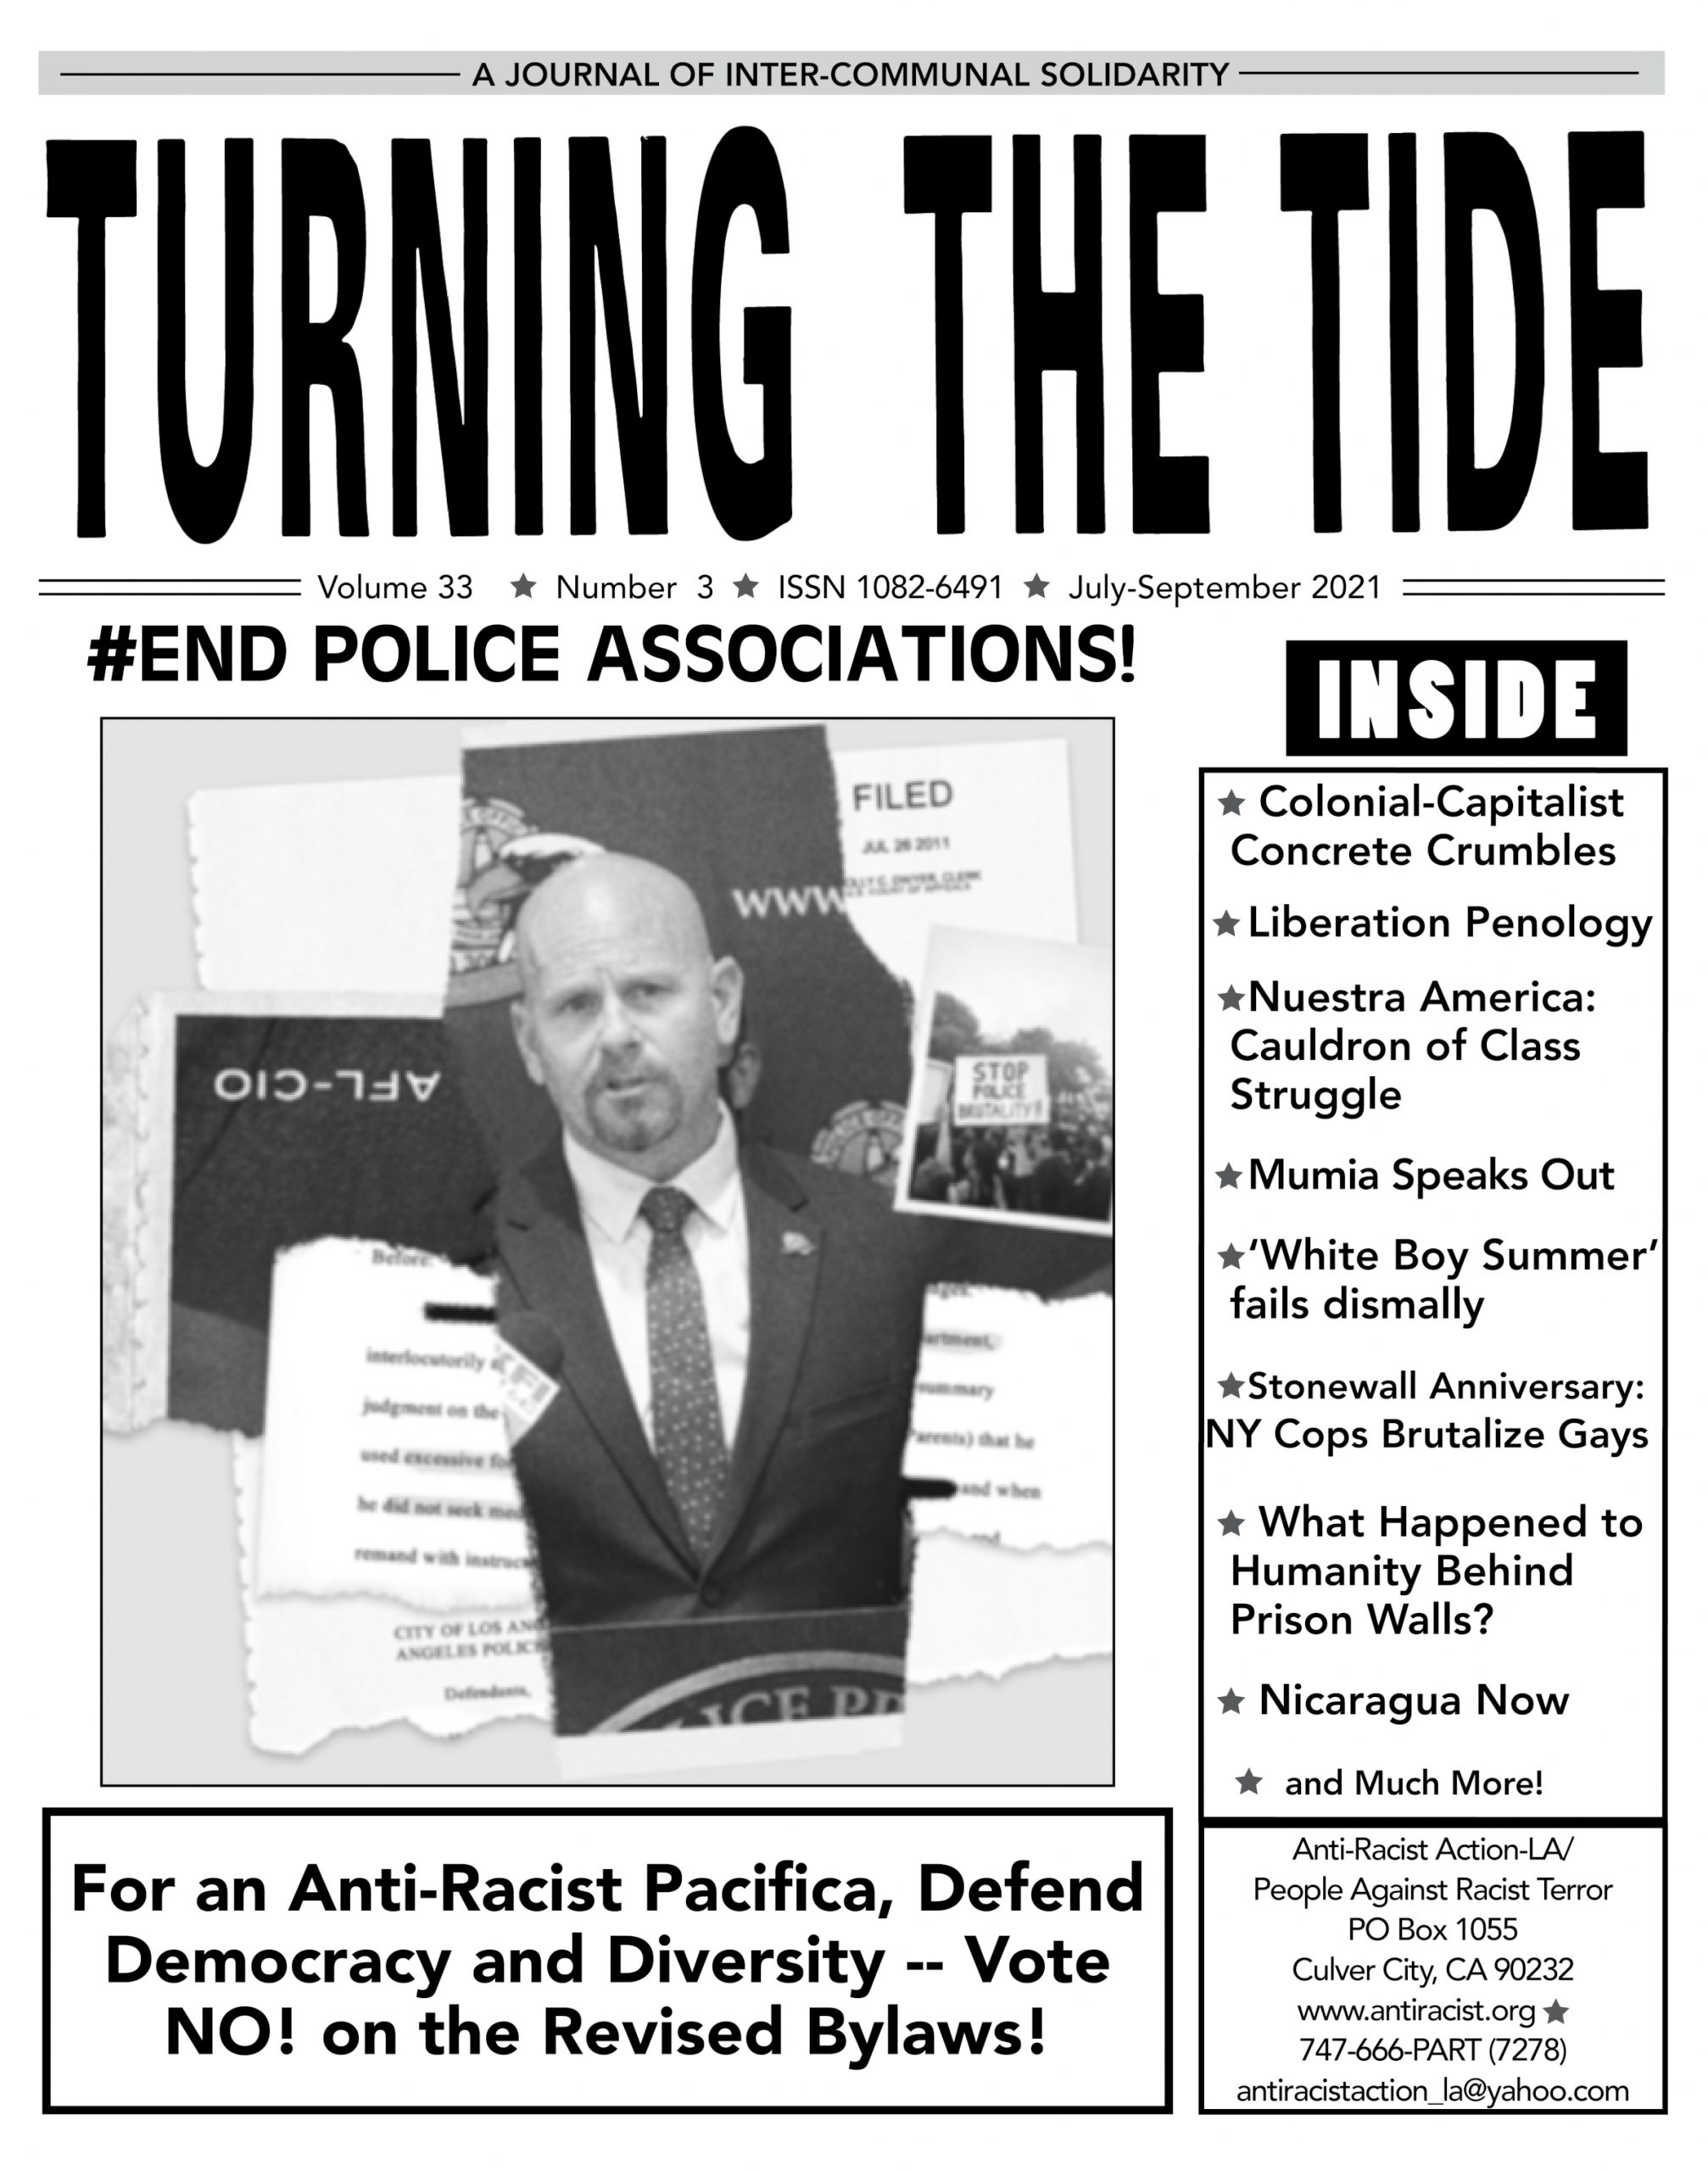 TTT Vol. 33 #3 July-Sept. 2021